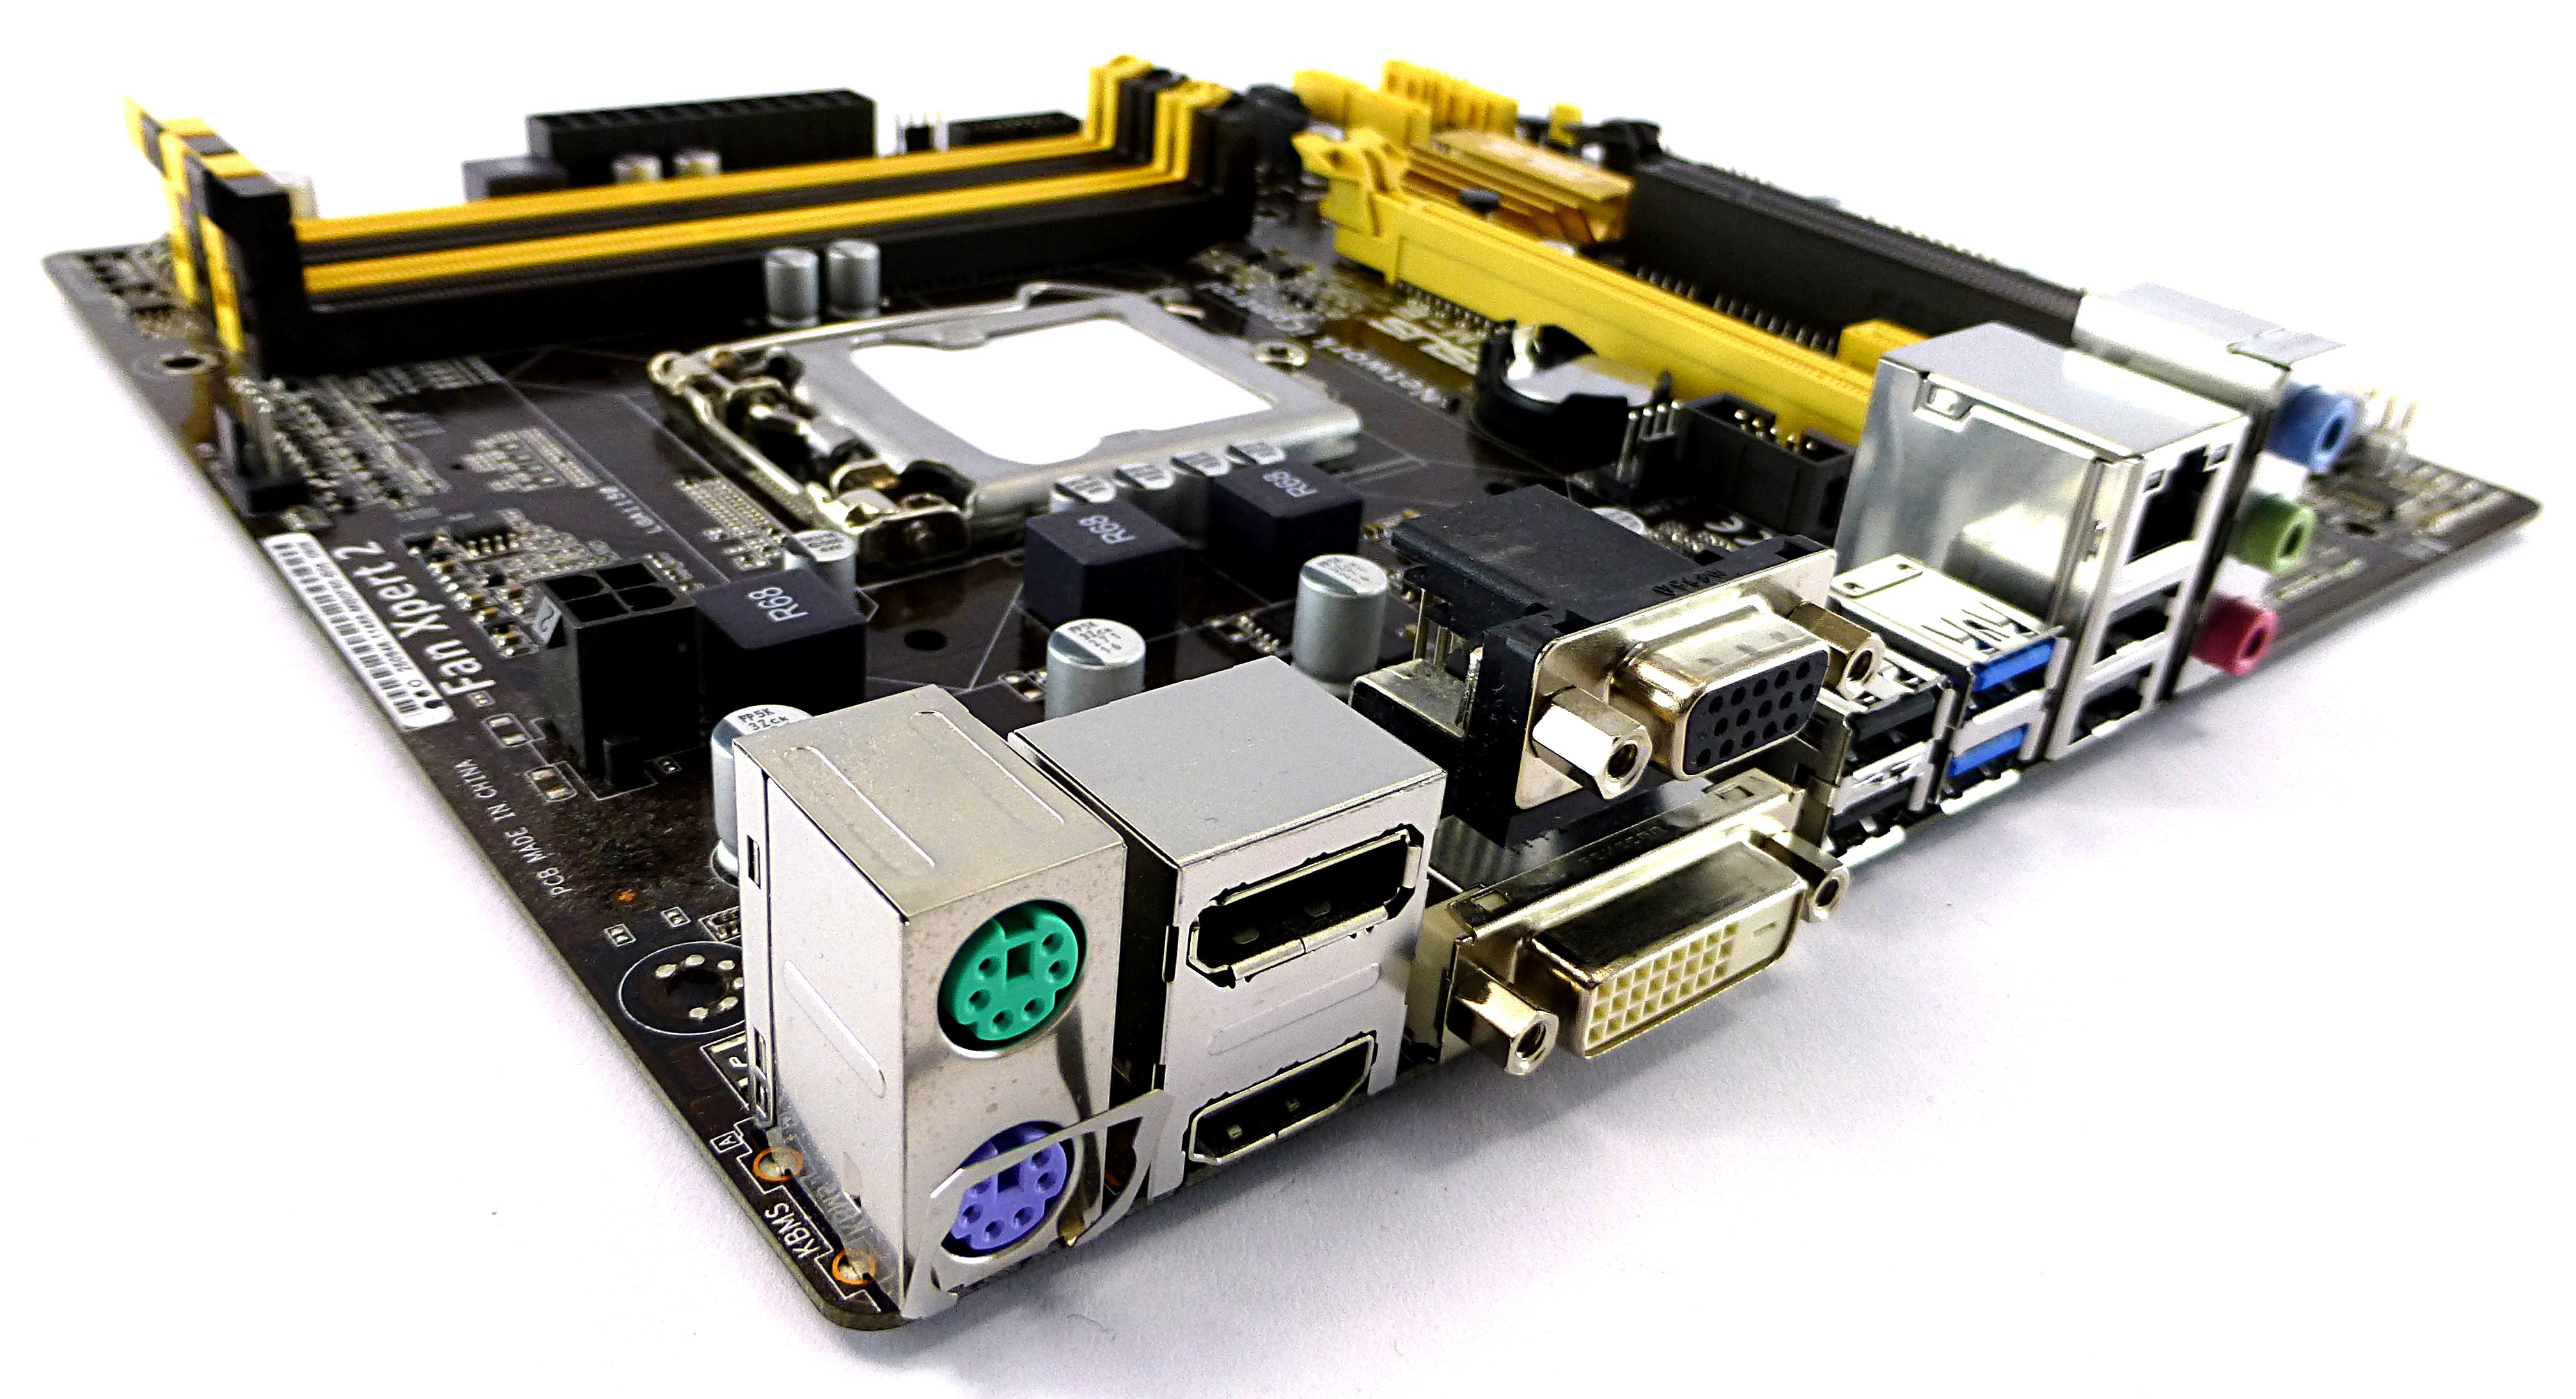 B85M-E Asus Intel LGA1150 USB 3.0 Motherboard uATX